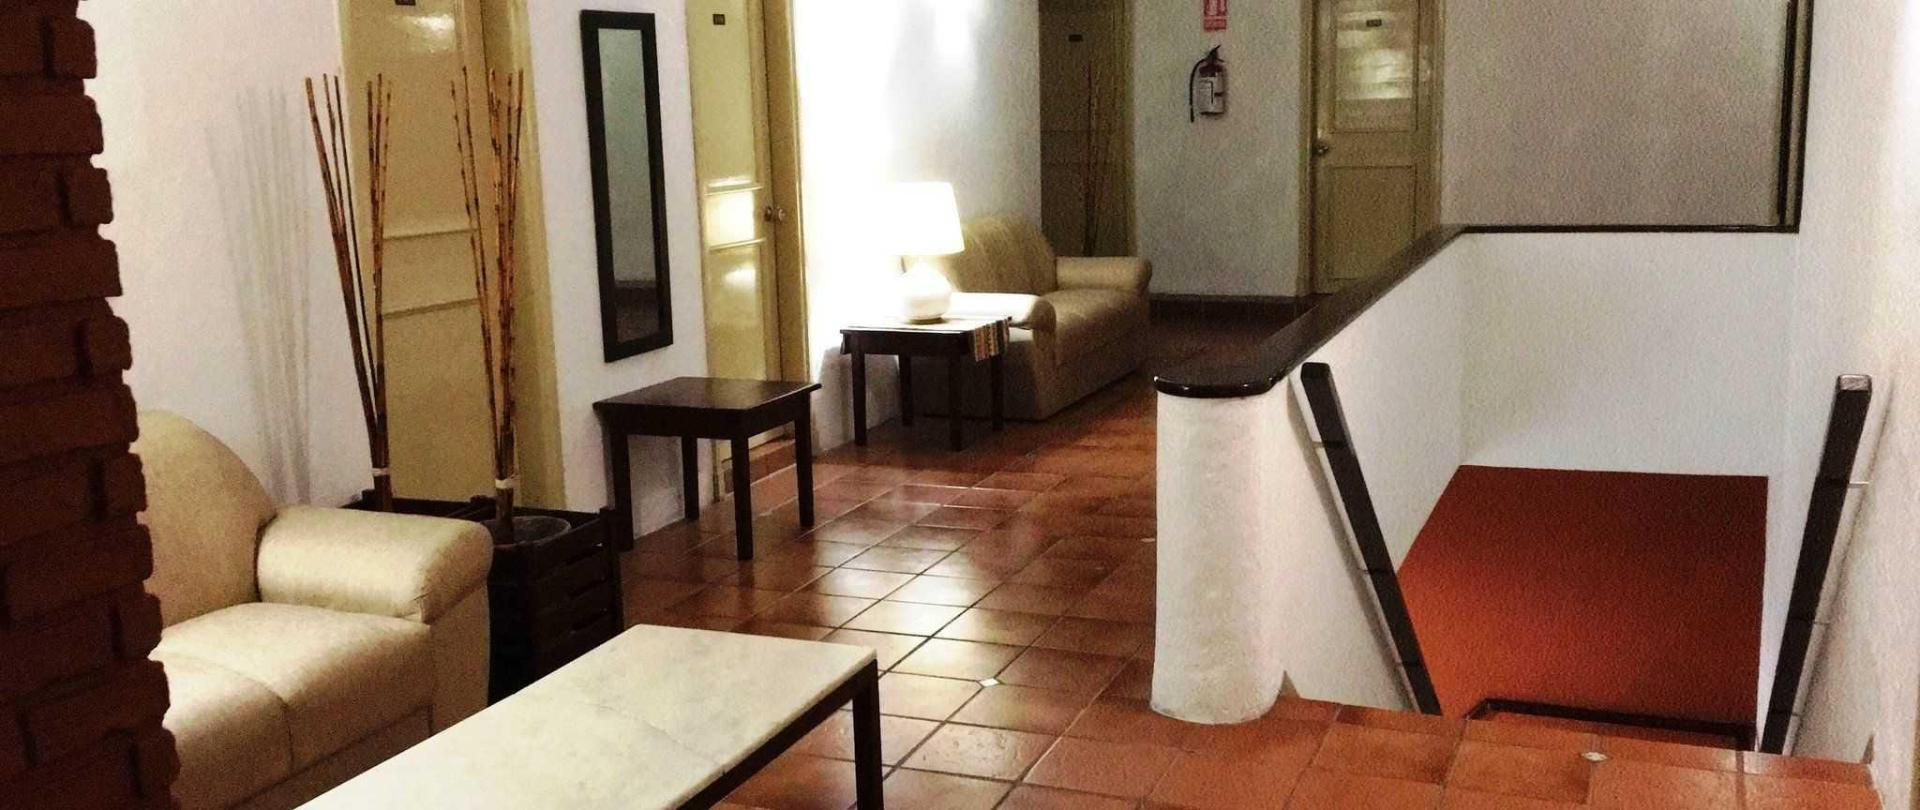 hotel-pa.jpg